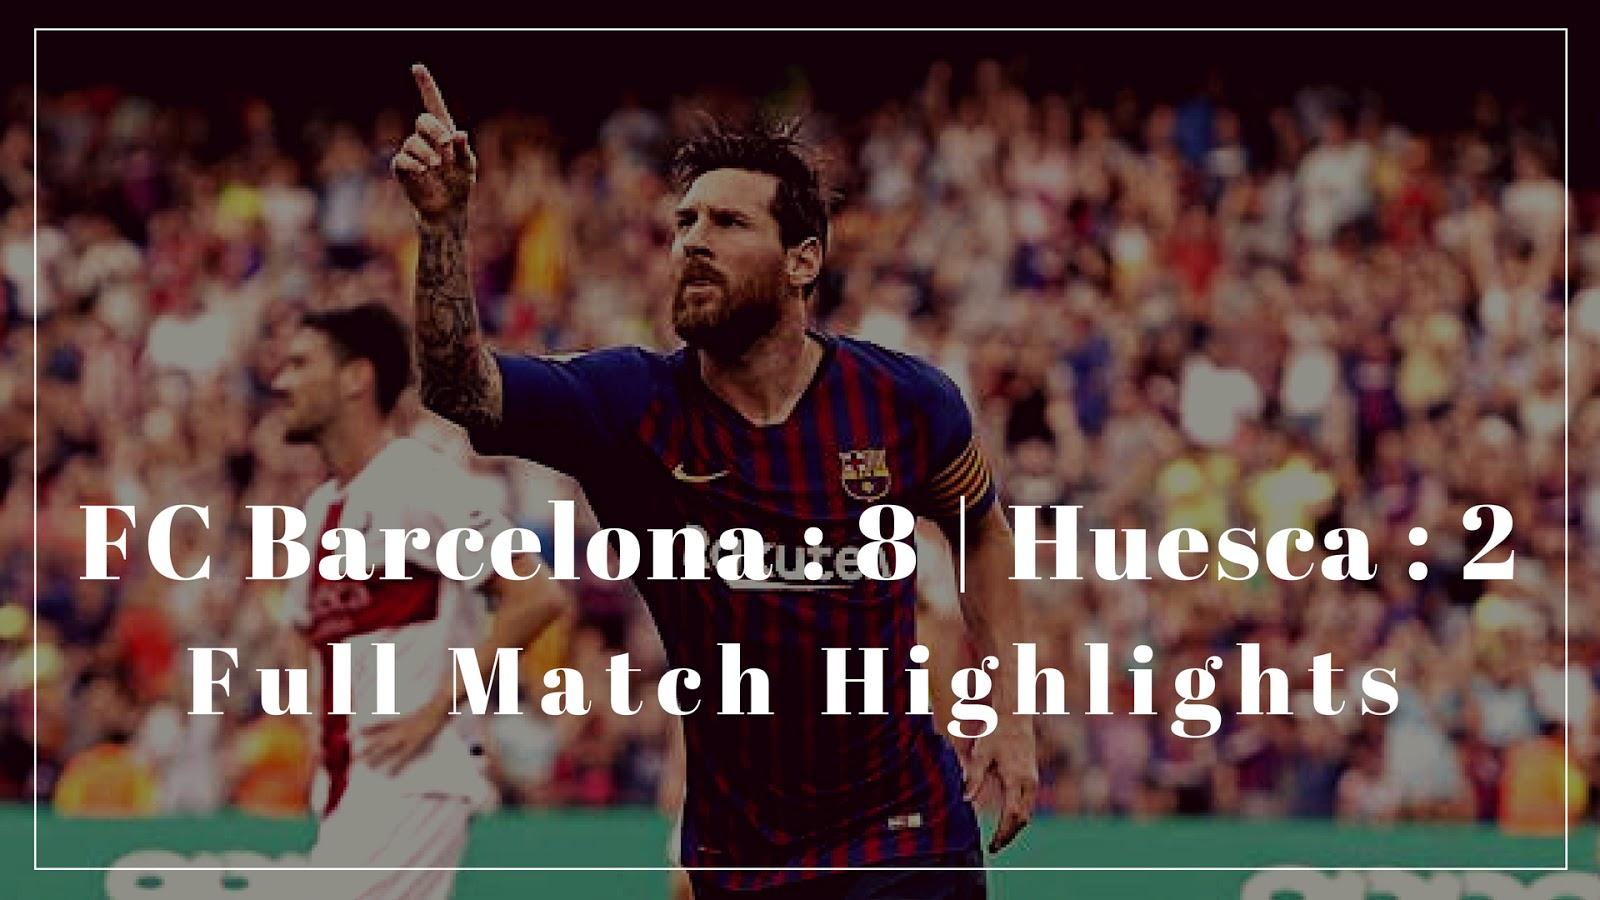 FC Barcelona vs Huesca Highlights | FC Barcelona - 8, Huesca - 2